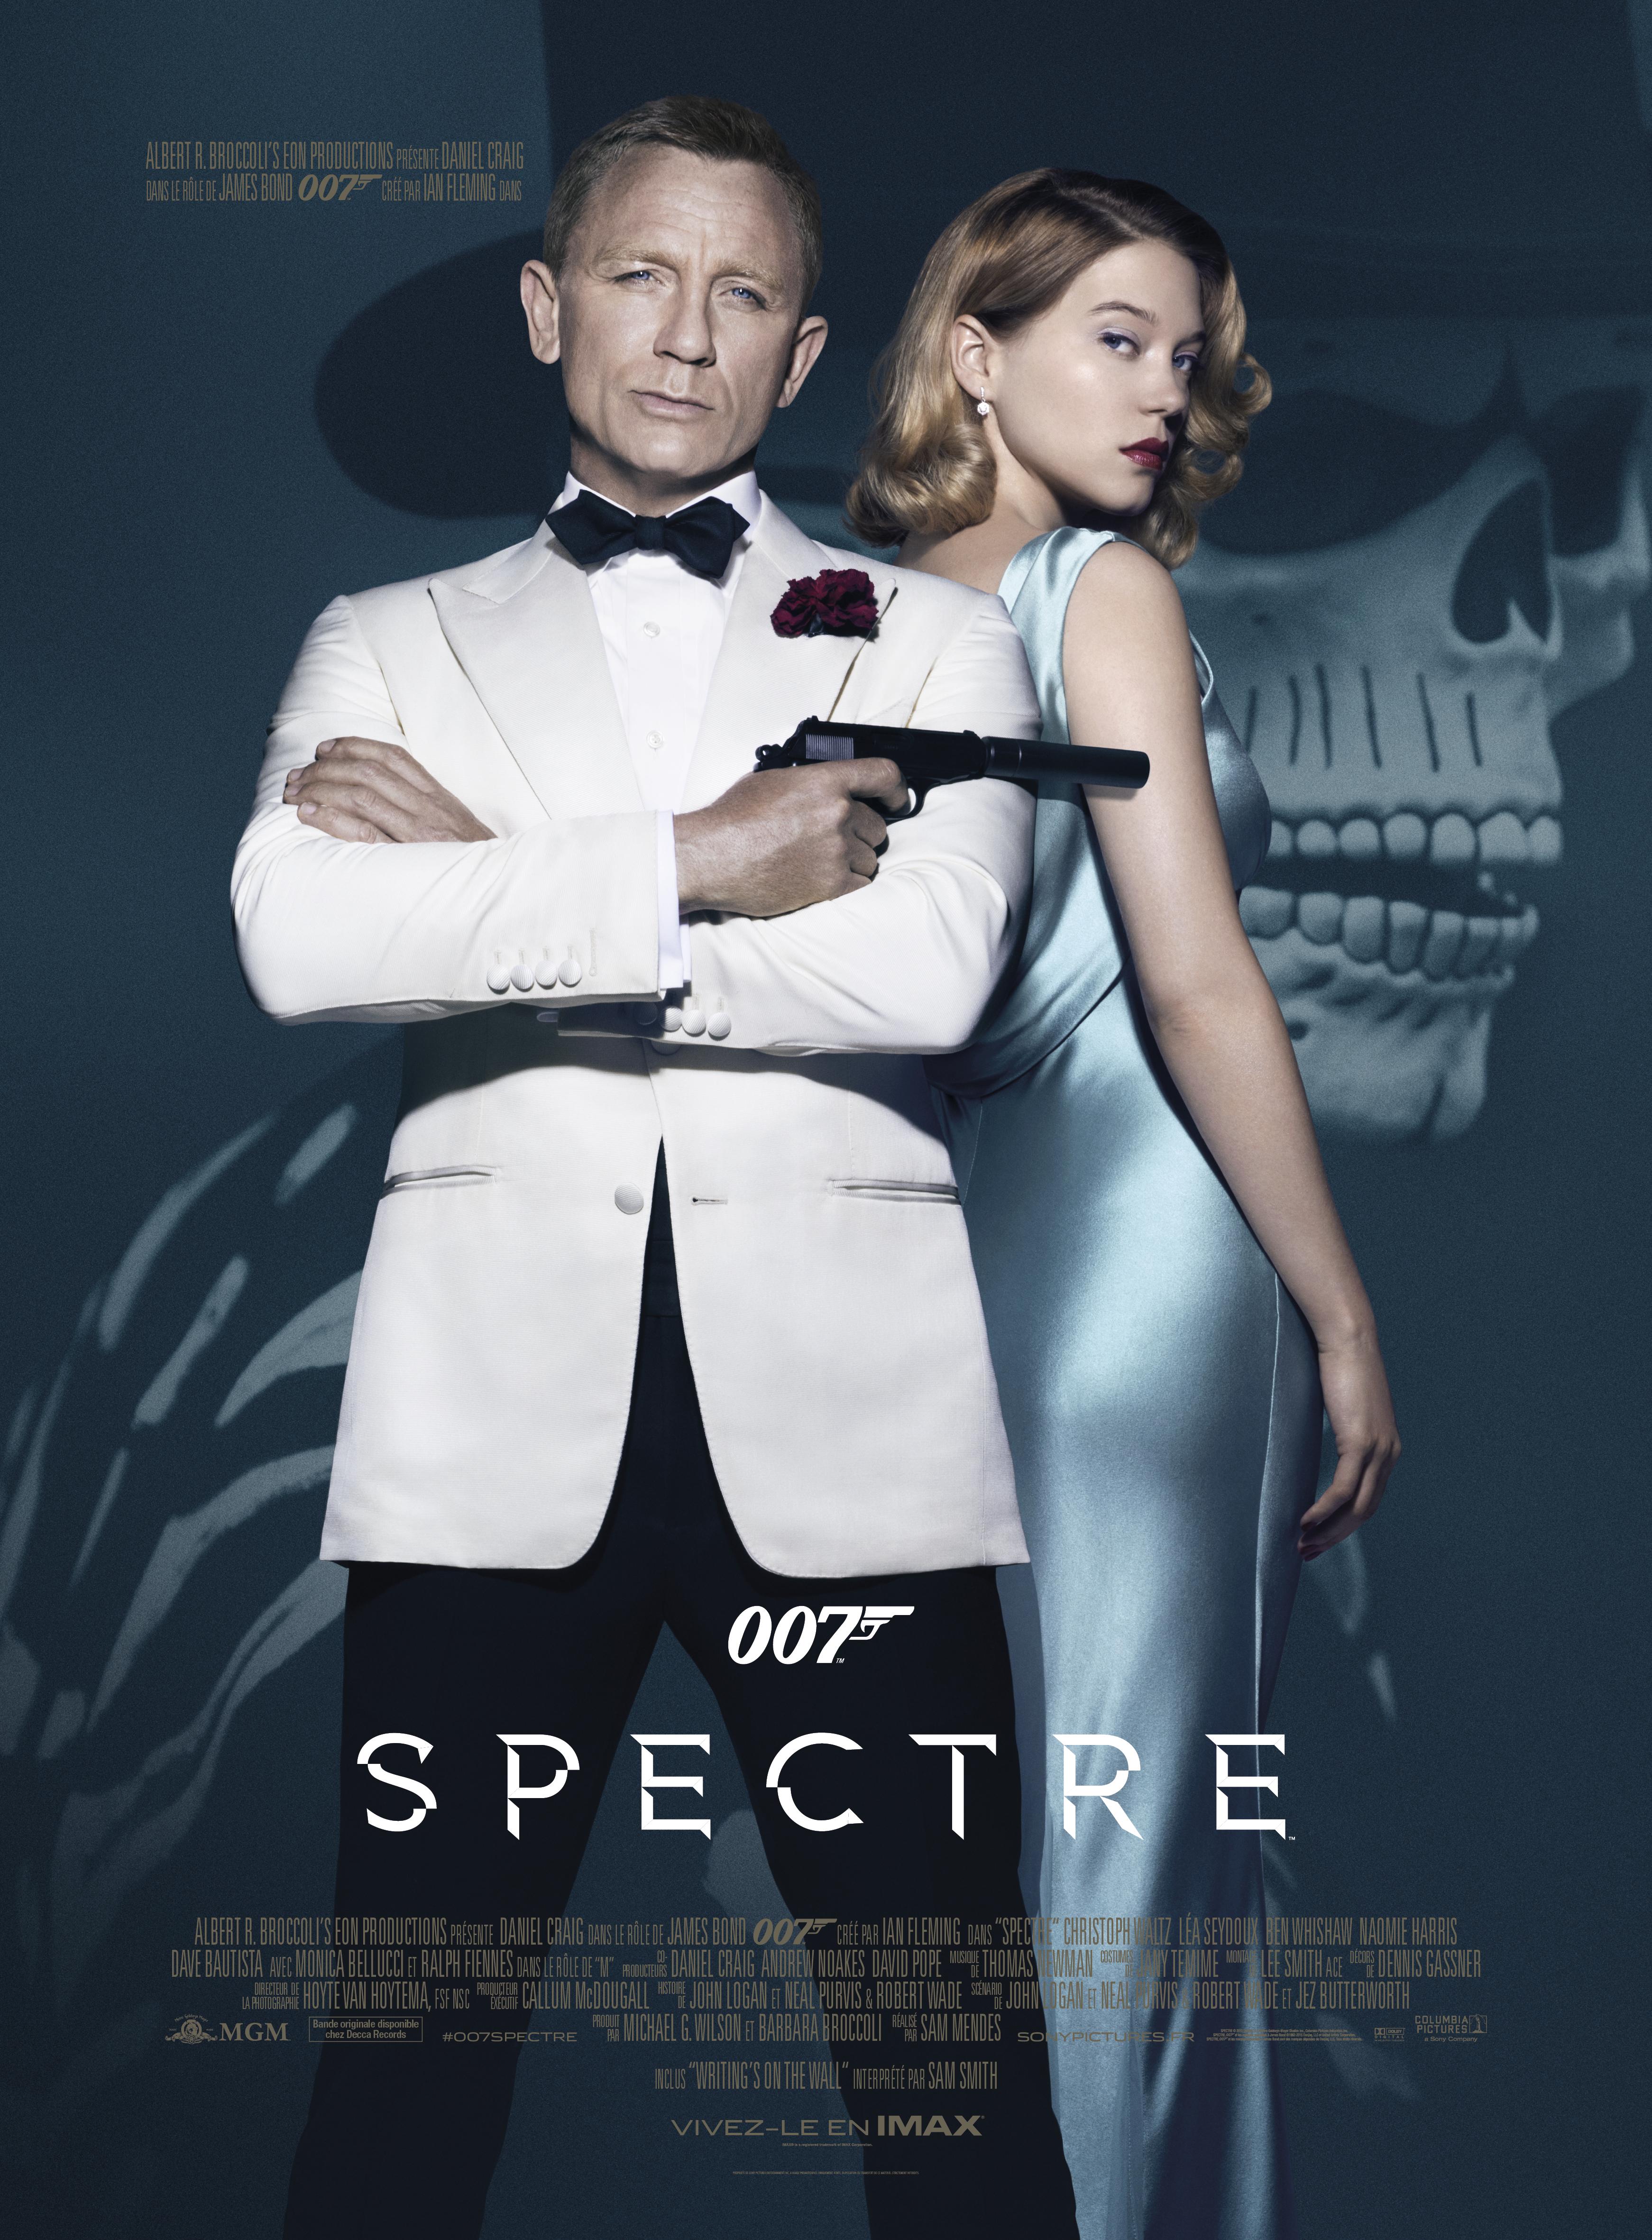 Daniel Craig and Léa Seydoux in Spectre (2015)